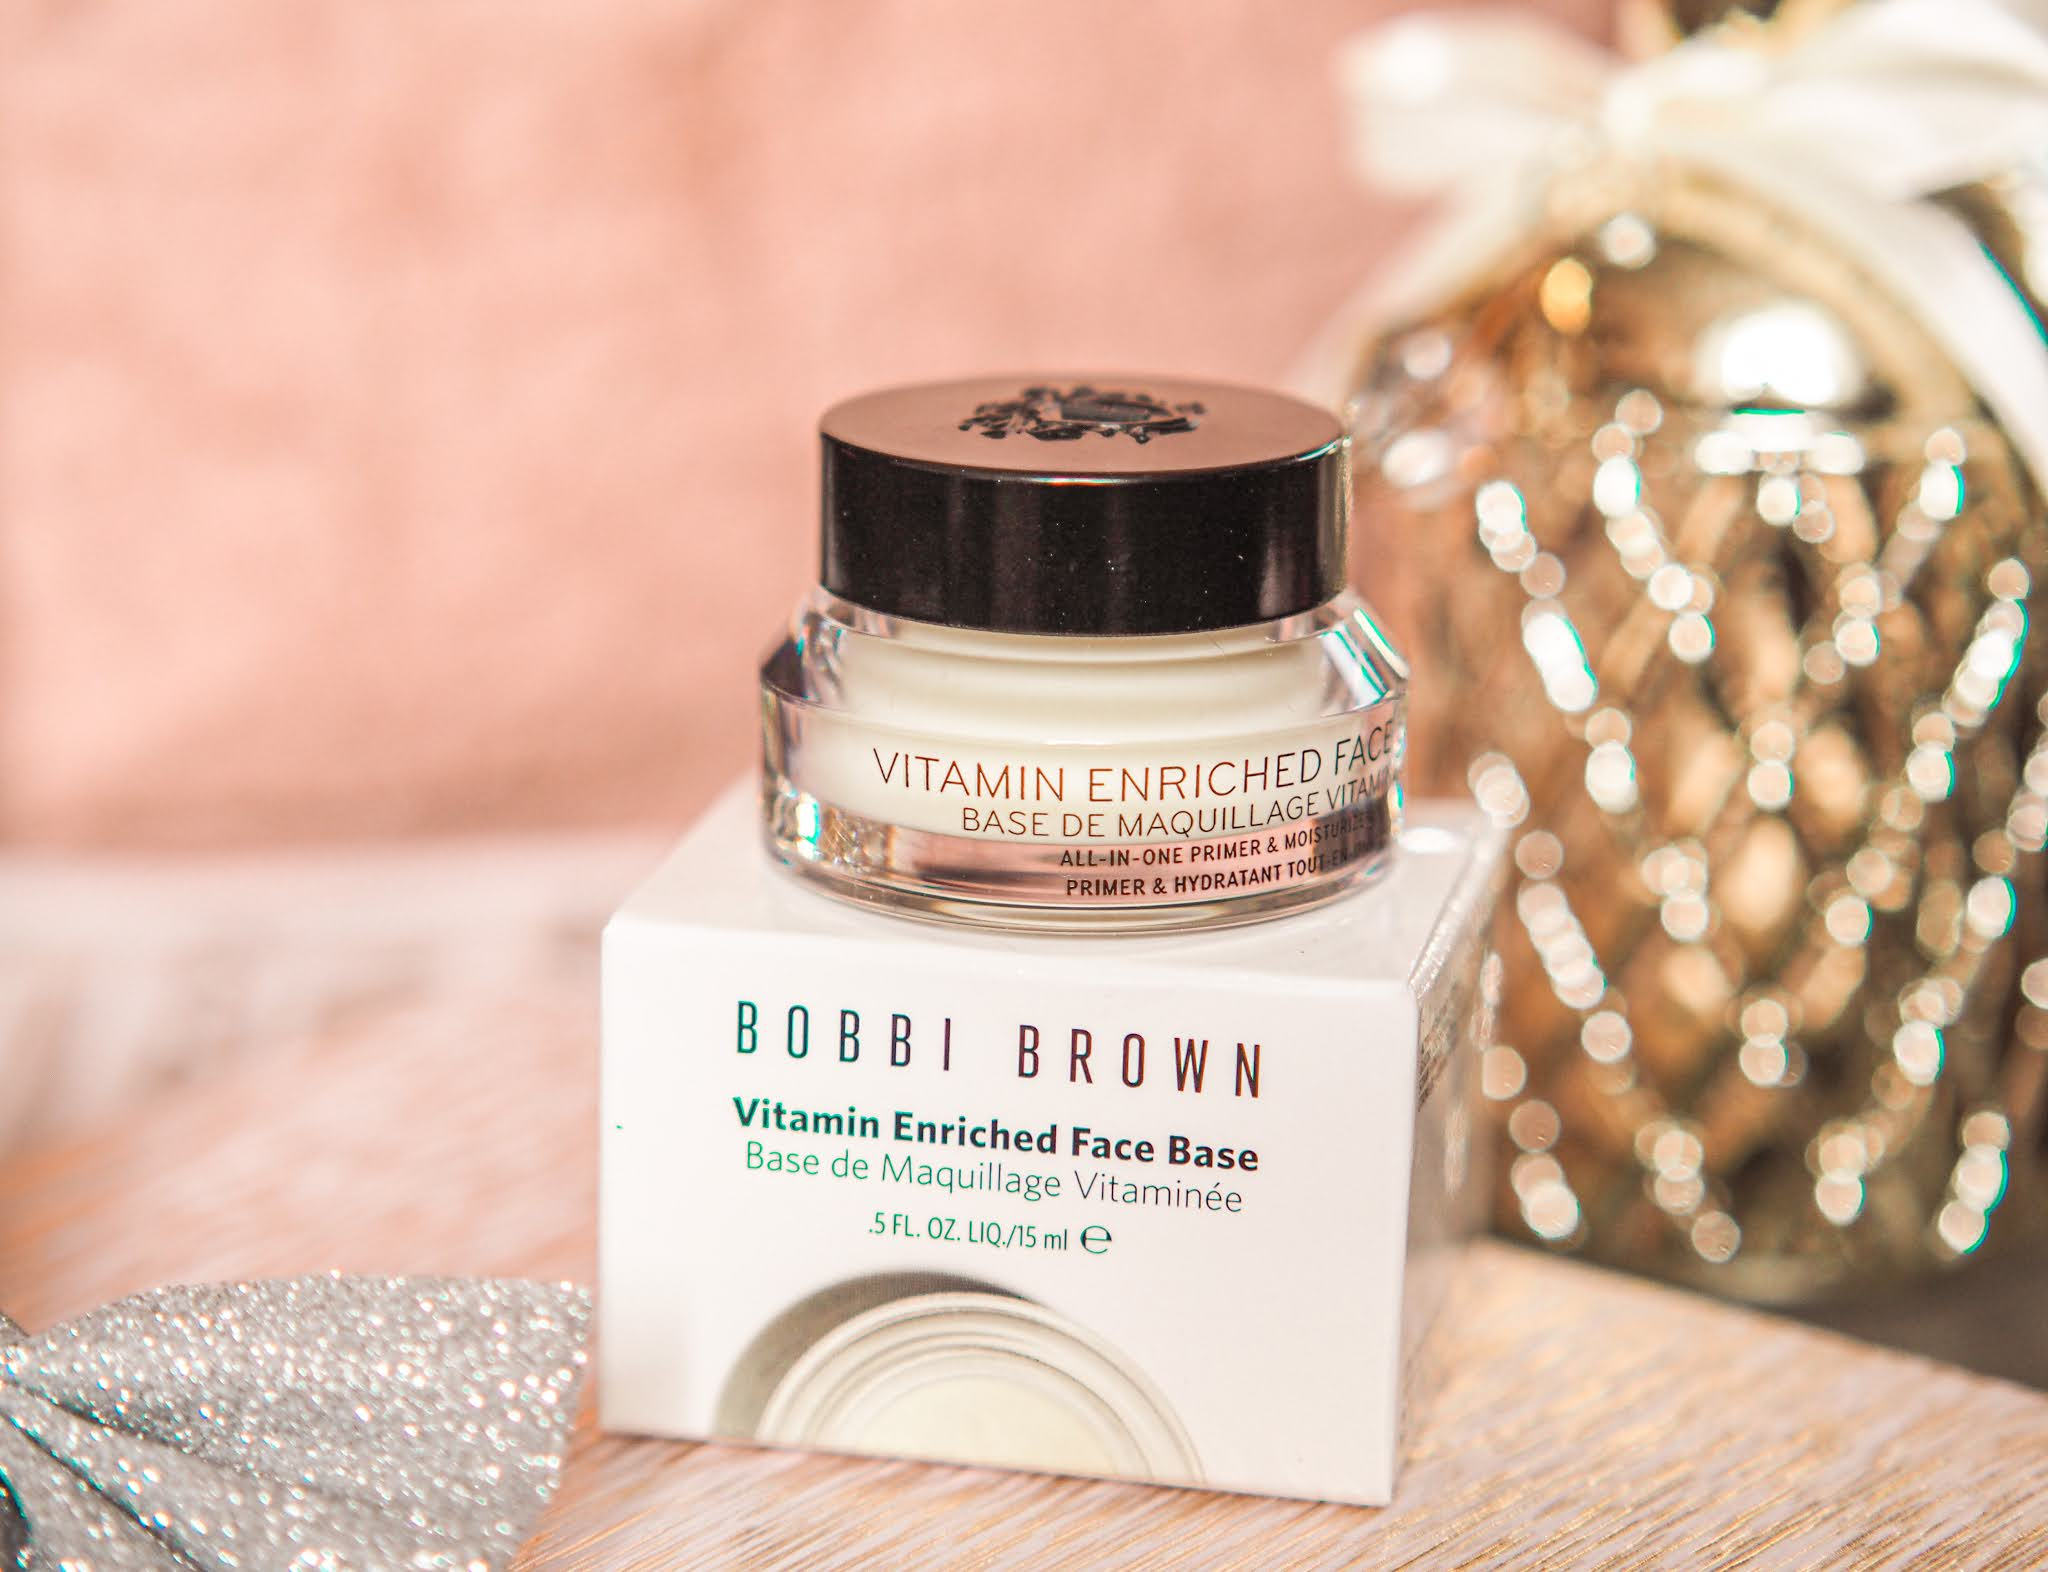 Bobbi Brown Vitamin Enriched Face Base vitaminova baza pod makeup notino.sk